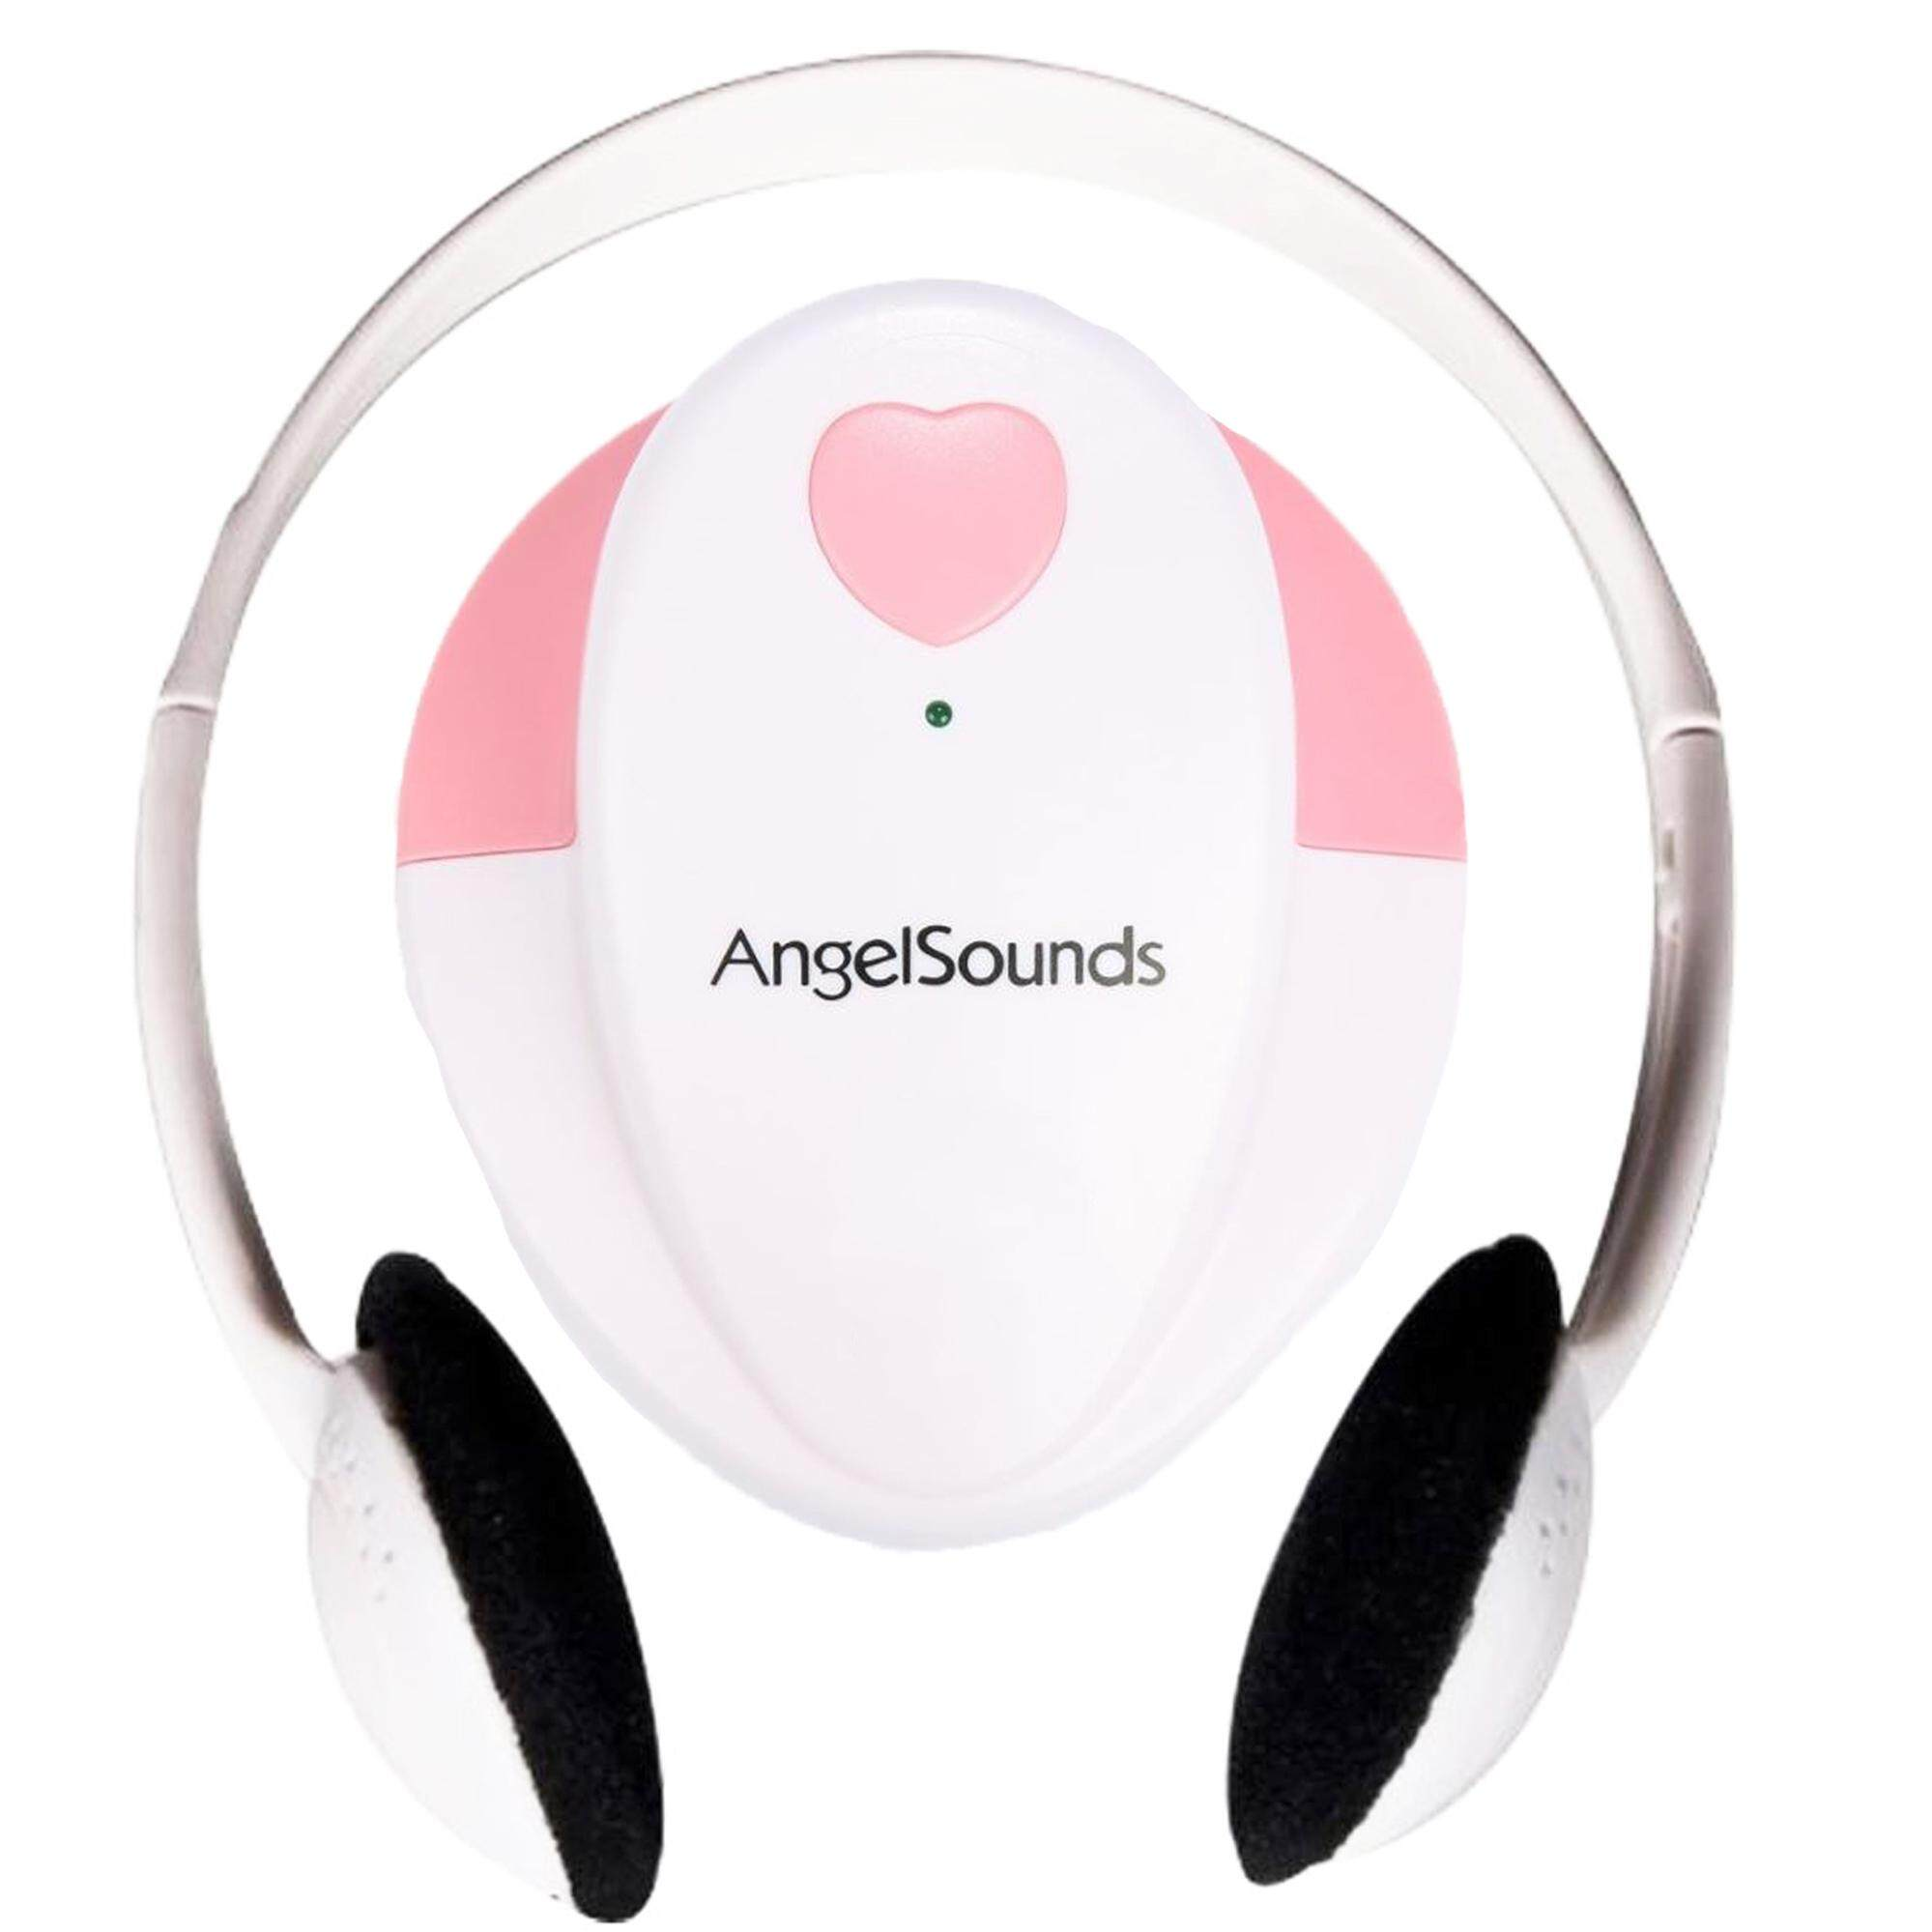 jumper เครื่องฟังเสียงหัวใจทารกในครรภ์ รุ่น angelsounds jpd100s - white .